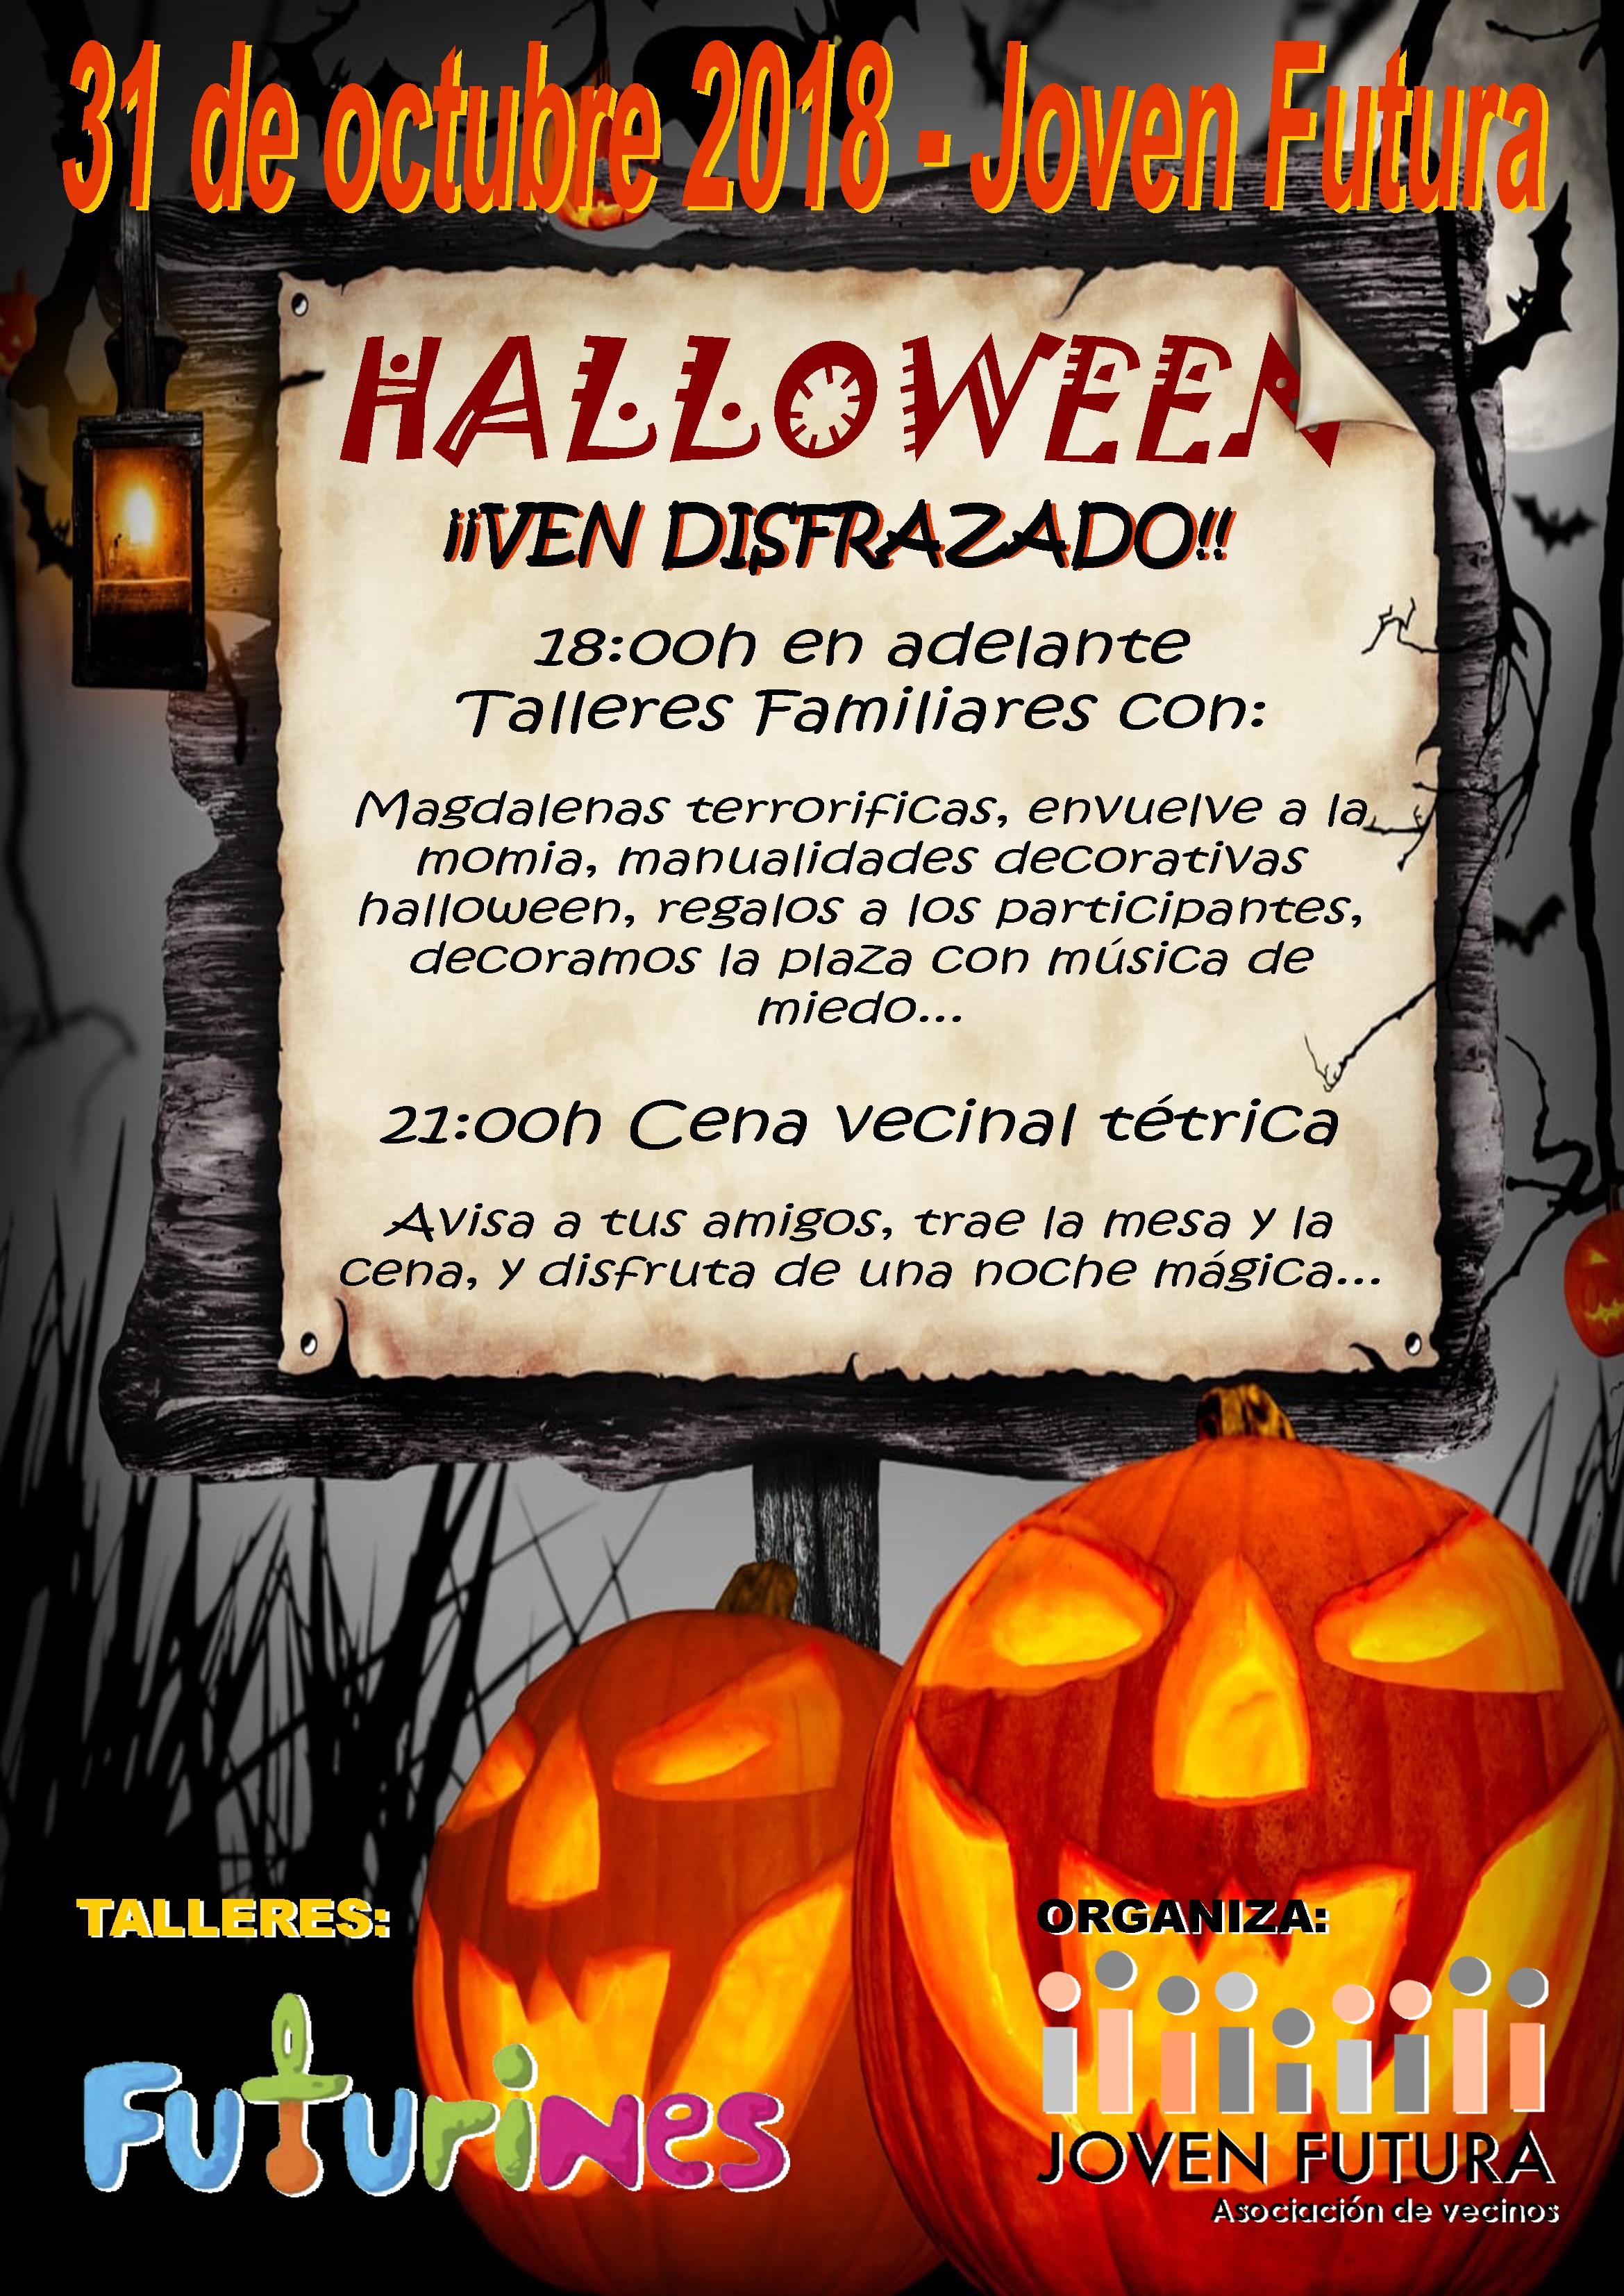 2018-10-31 Cartel Halloween 2018 Joven Futura